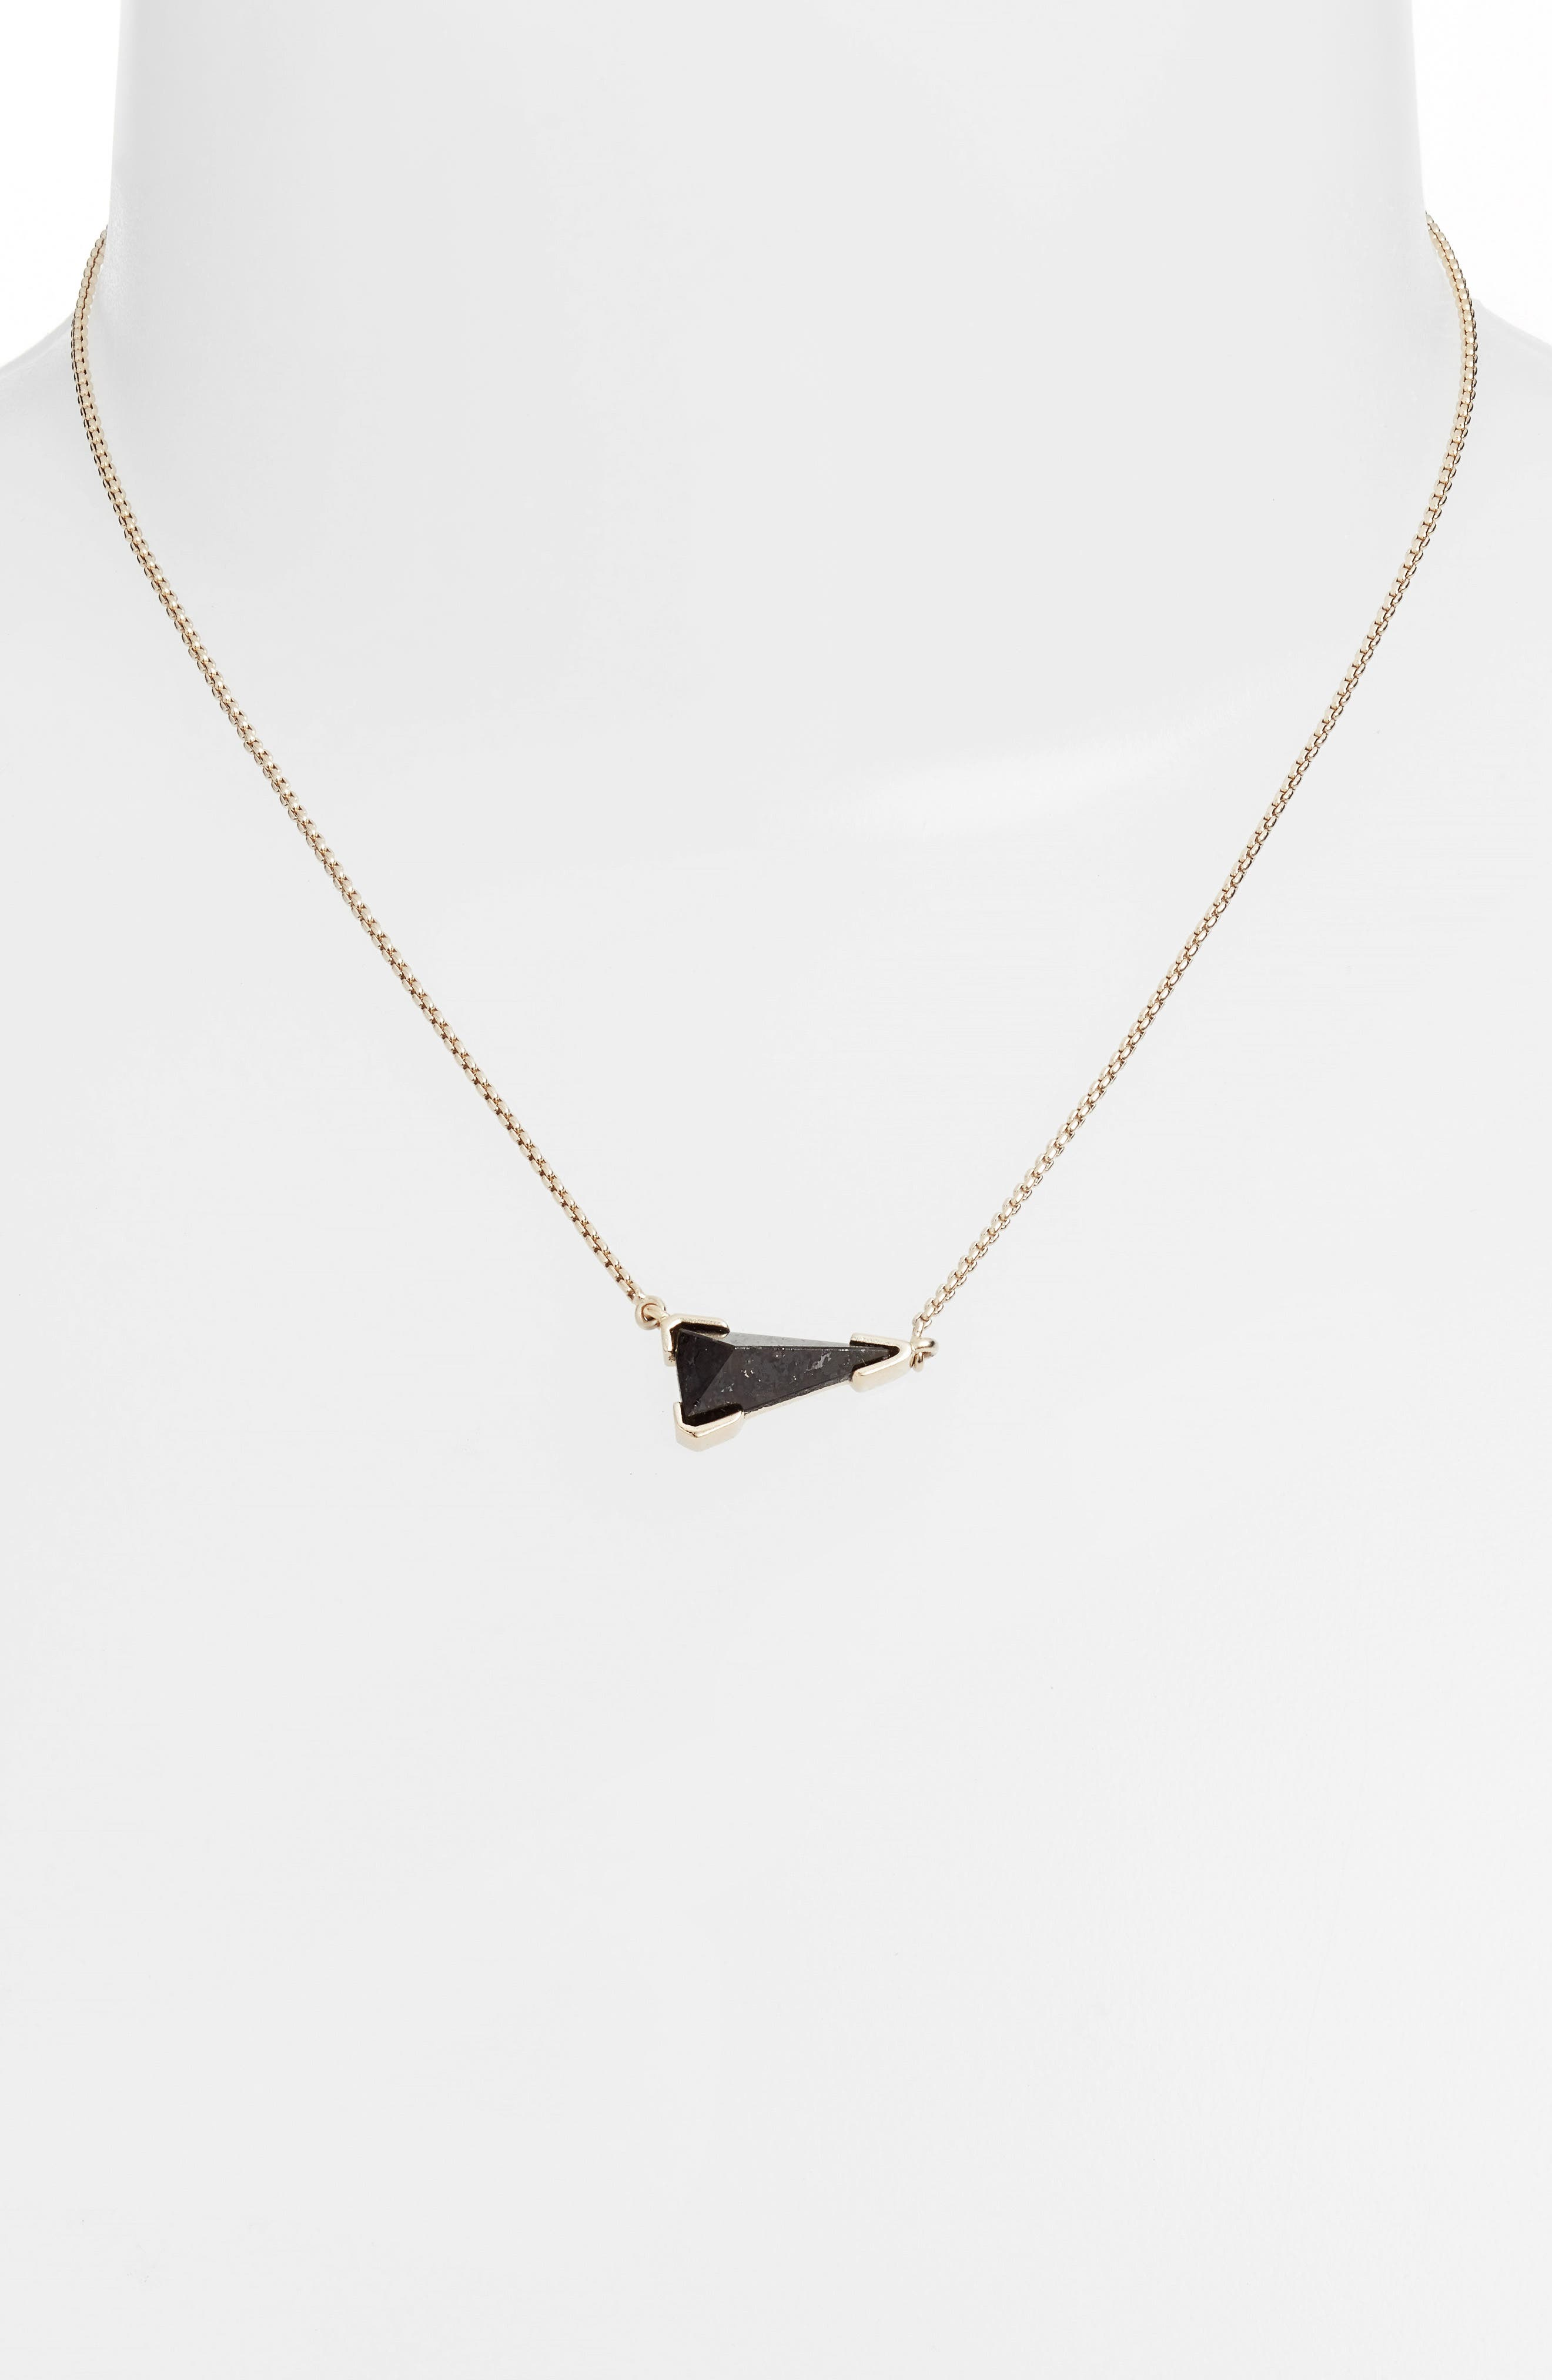 KENDRA SCOTT Racquel Pendant Necklace